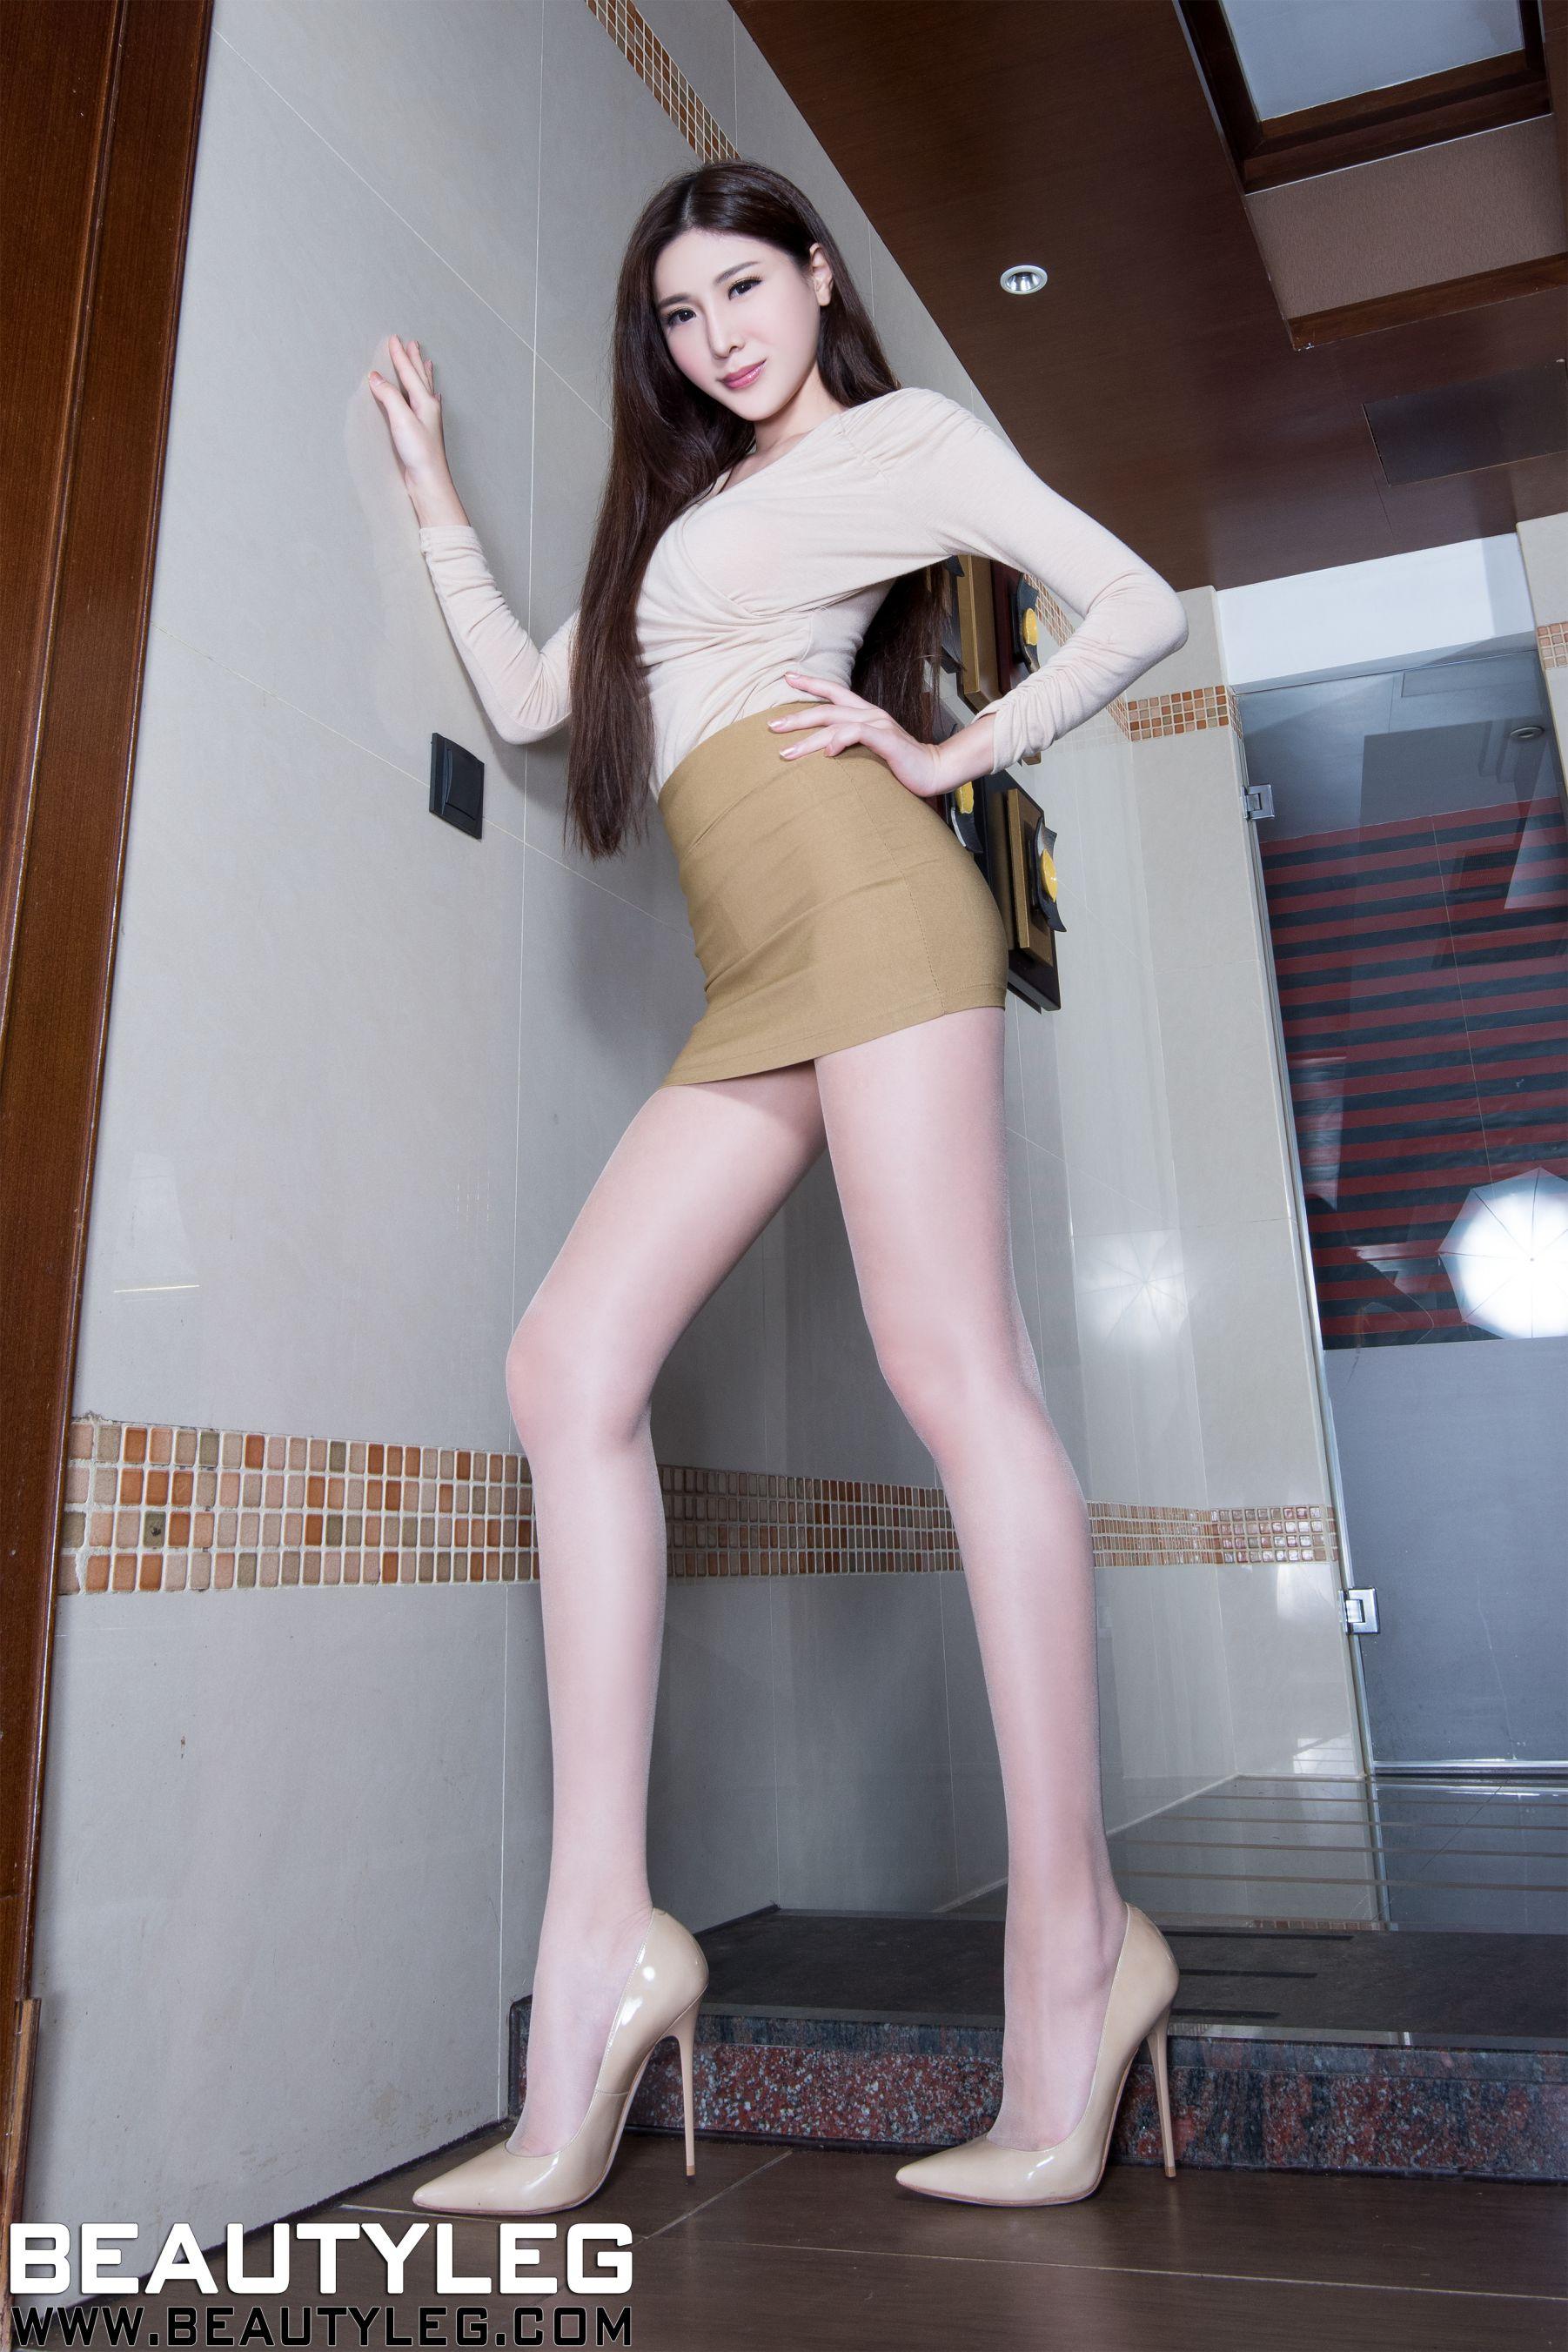 VOL.482 [Beautyleg]美腿:李小星(Beautyleg腿模Xin)高品质写真套图(33P)